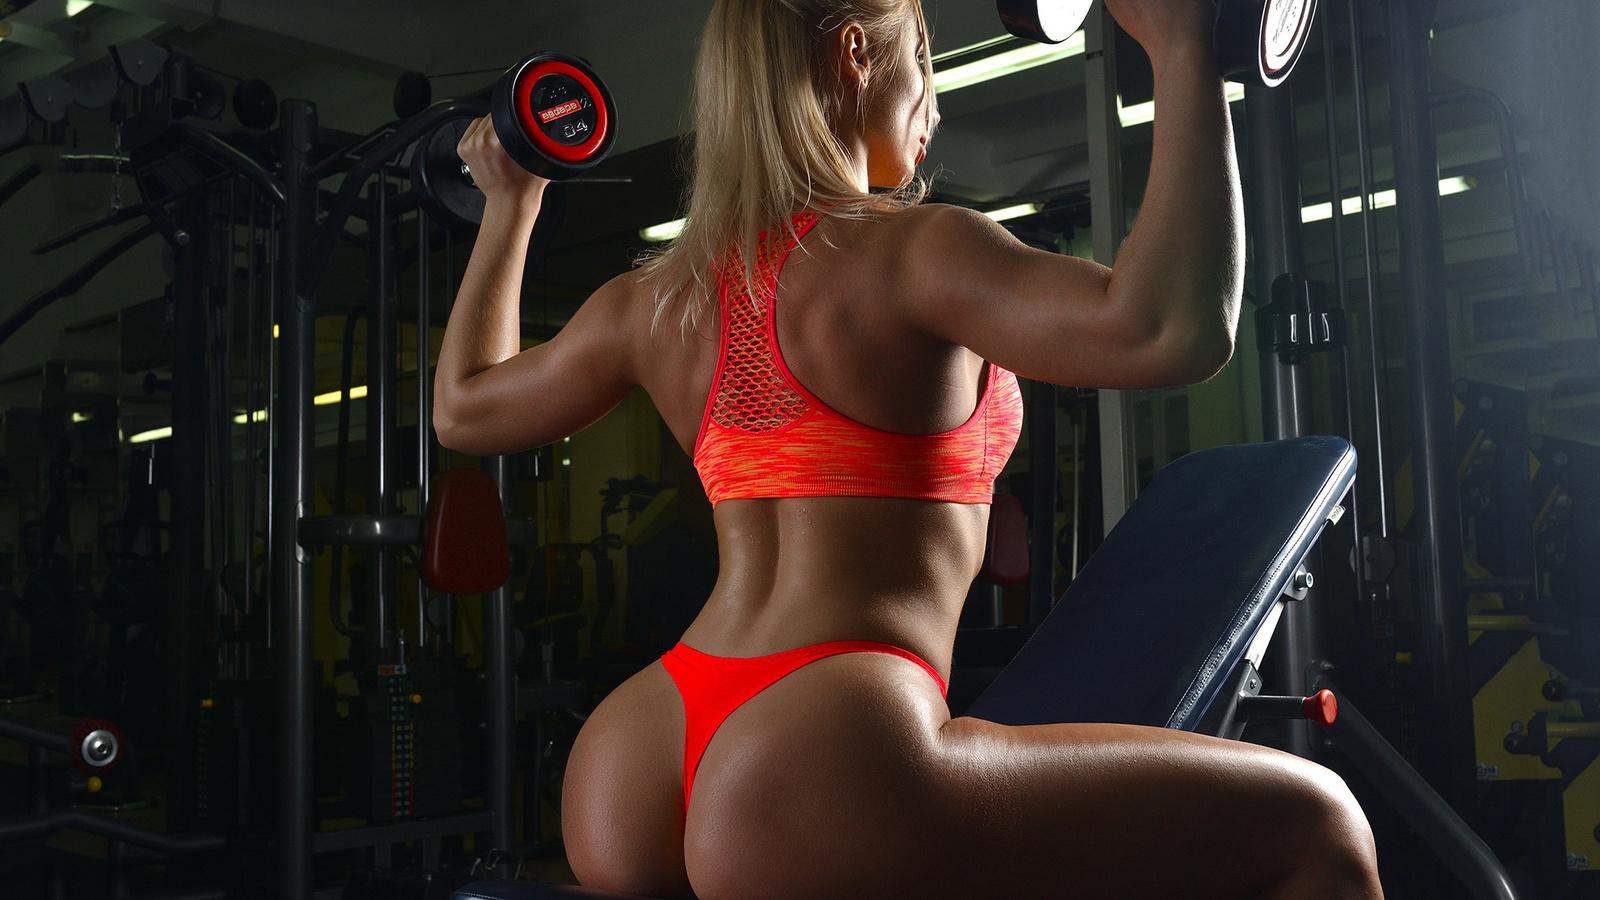 девушки в стрингах в фитнес клубах фото тут вовсе при